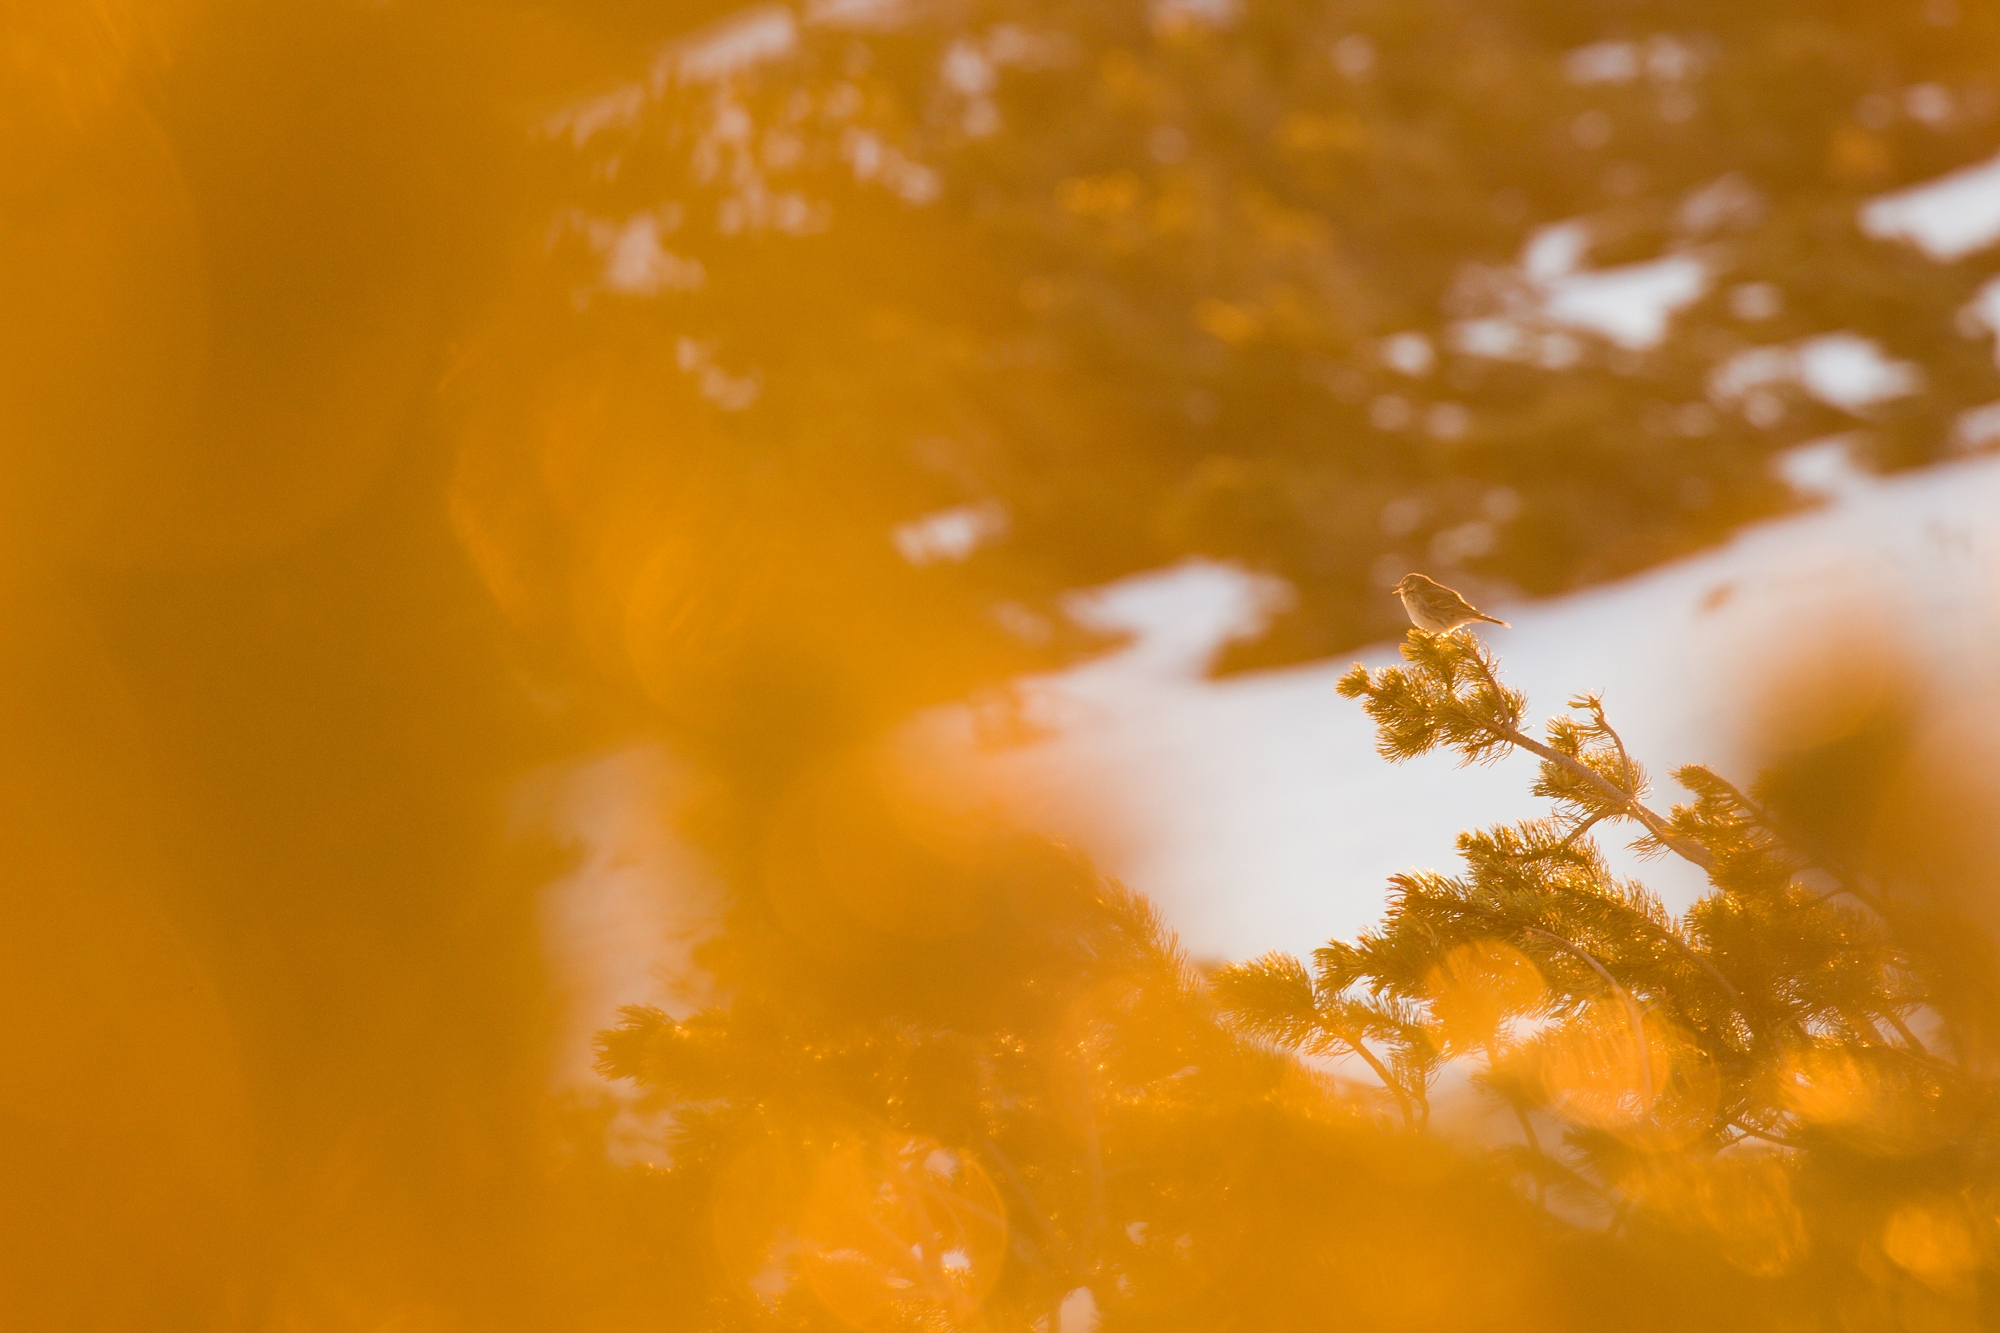 labťuška hôrna (Anthus trivialis) Tree pipit, Západné Tatry, Slovensko Canon EOS 6D mark II, Canon 100-400 mm f4.5-5.6 L IS II USM, 400 mm, f7.1, 1/100, ISO 400, 22. apríl 2020